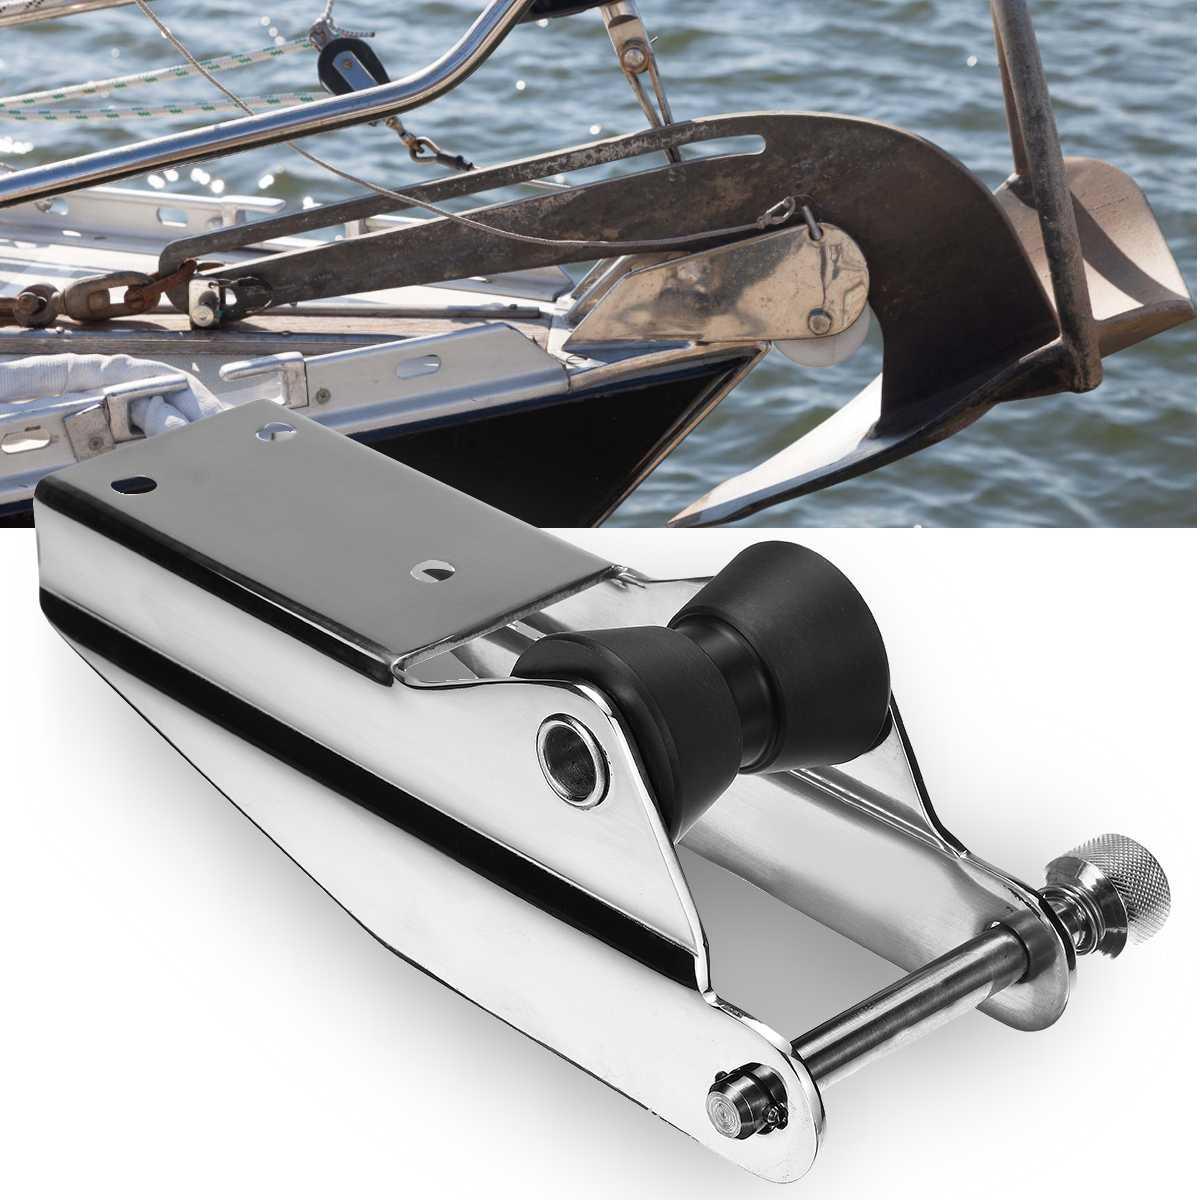 316 Stainless Steel Heavy   Bow Anchor Roller For Fixed Marine Boat Docking Black Nylon Roller Spring Loaded Pin Prevent